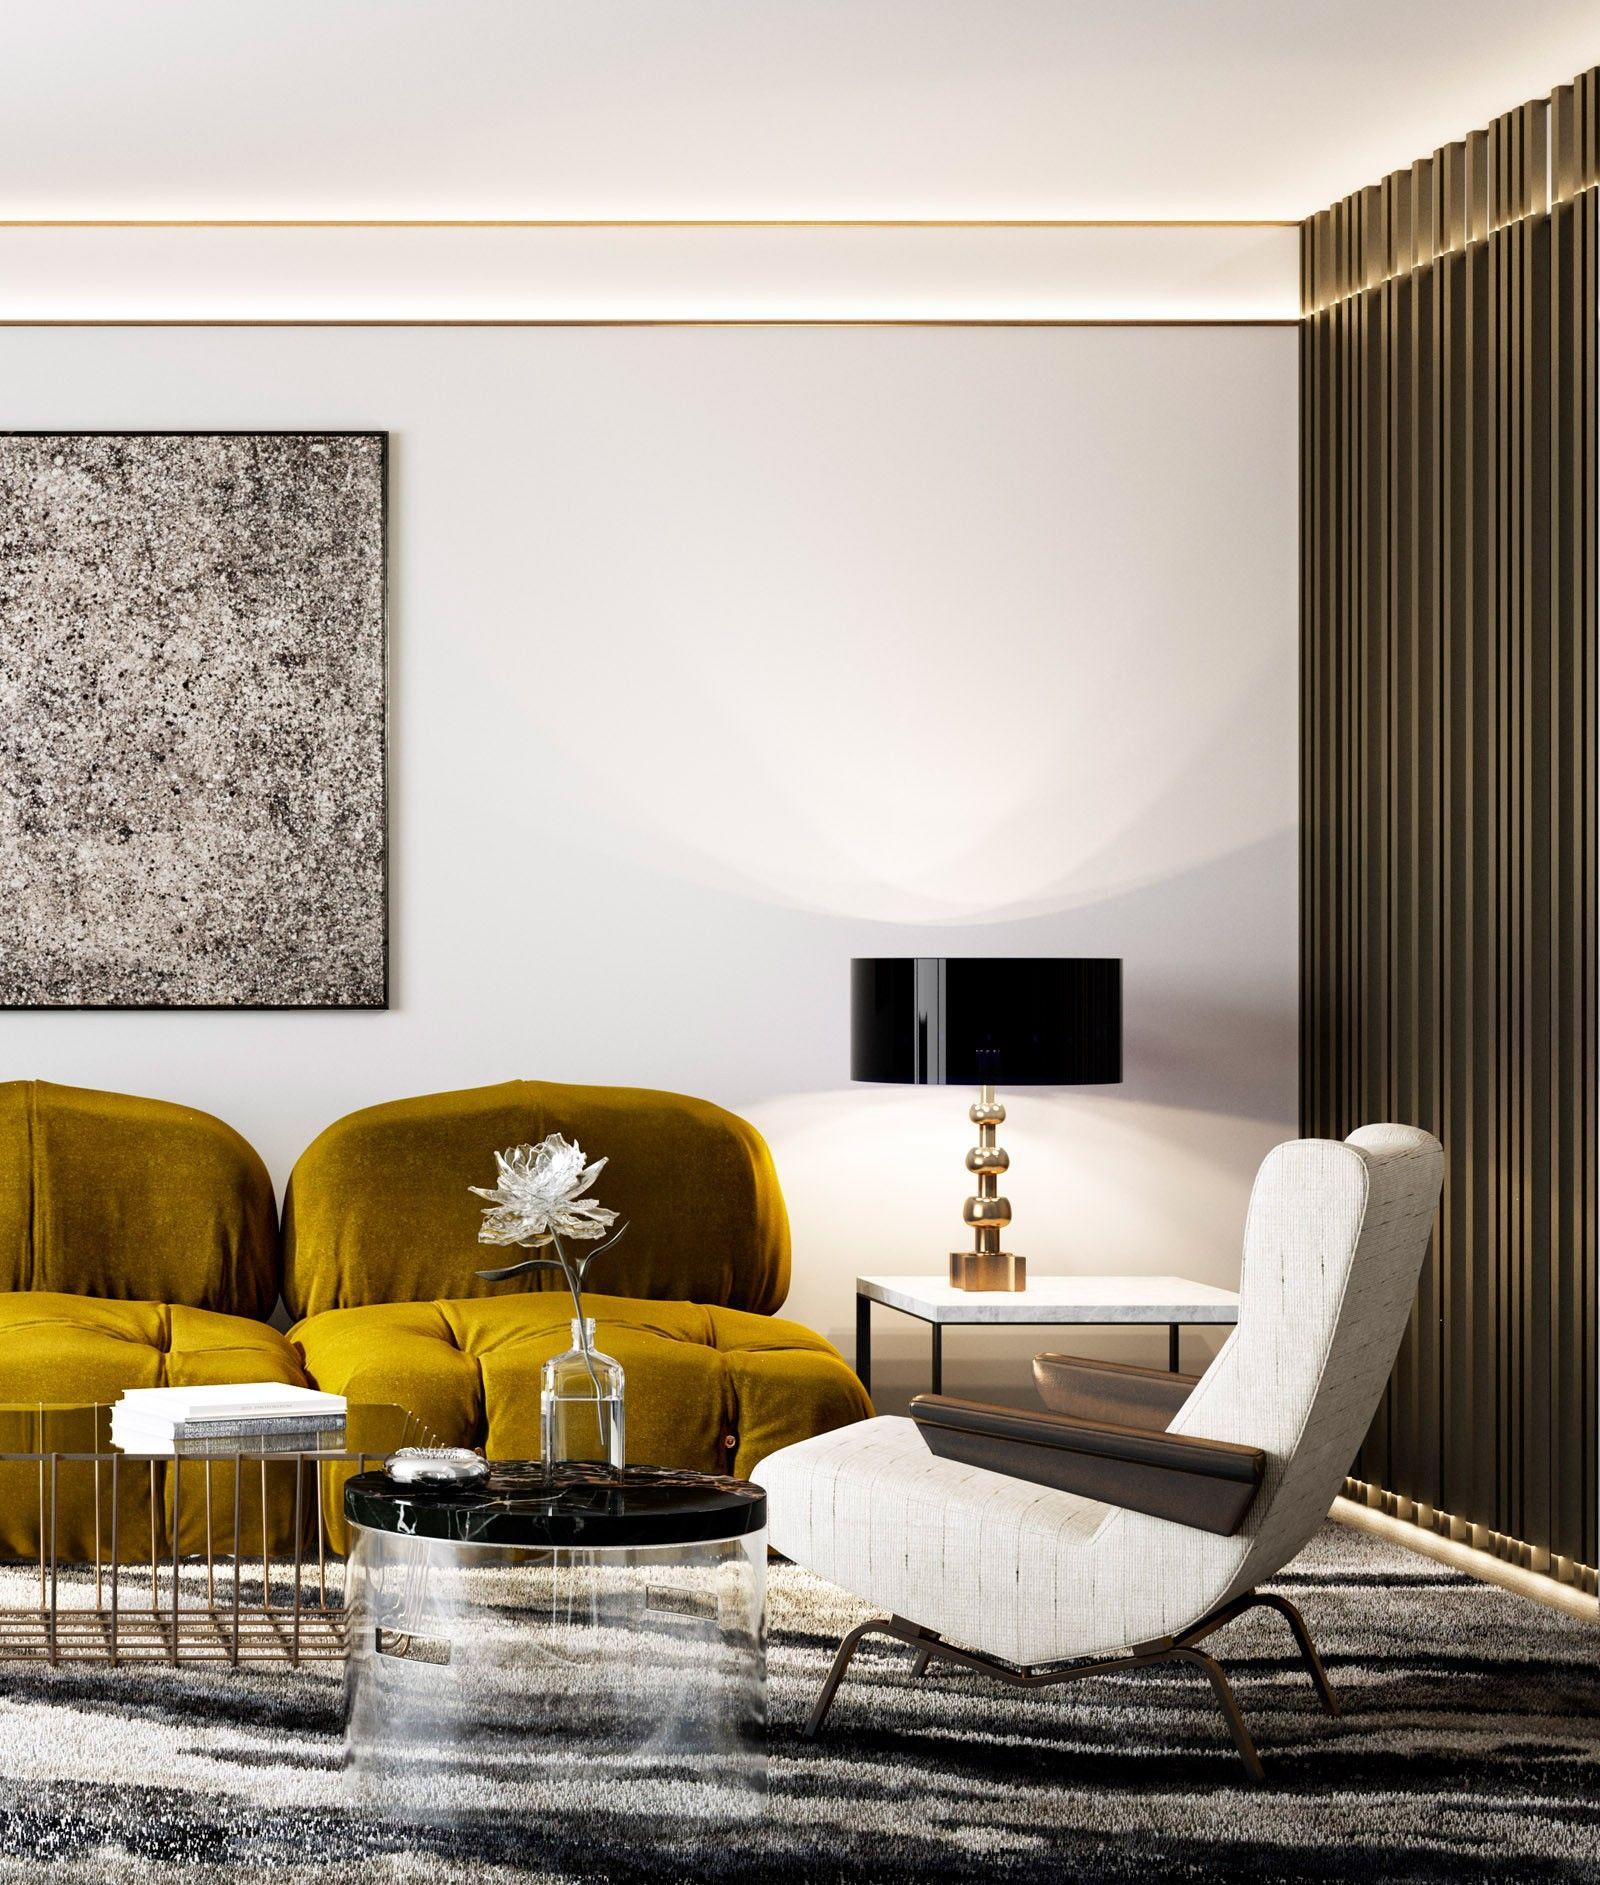 Pin by guozi jessie on 黄棕色系 | Living room decor, Home ...